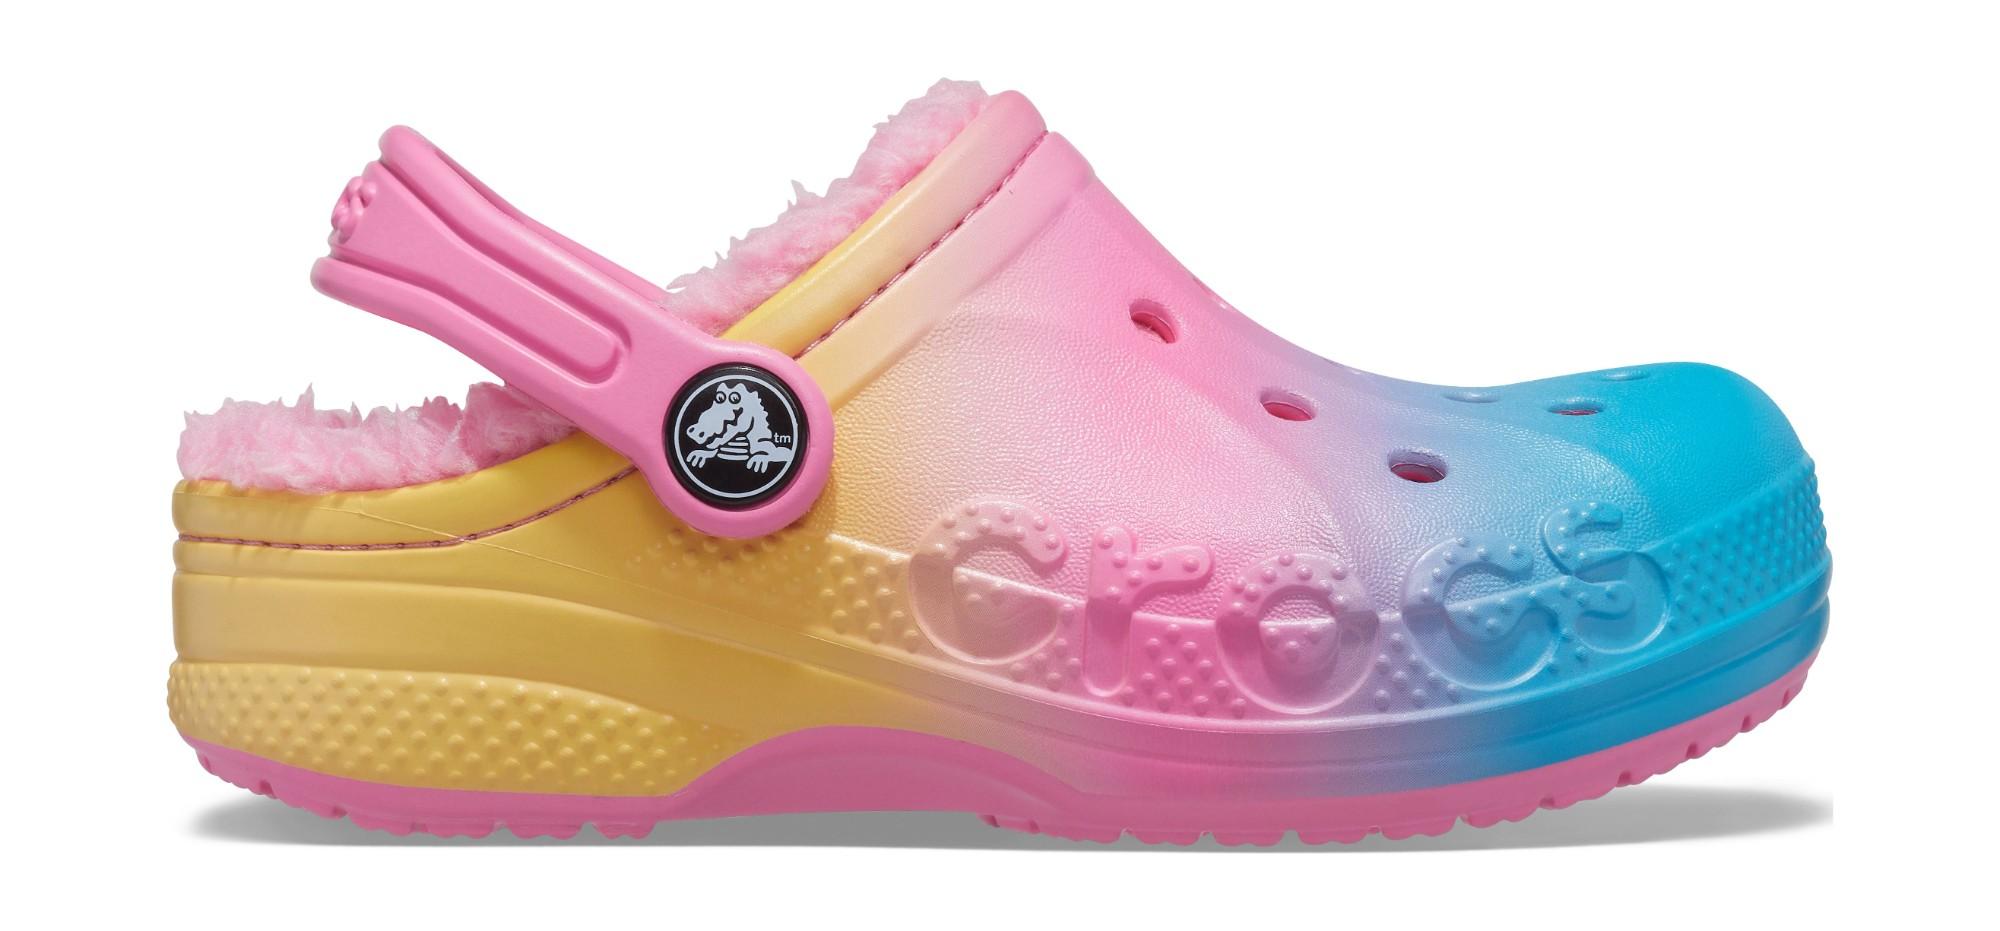 Crocs™ Baya Printed Lined Clog Kid's Pink Lemonade/Multi 24